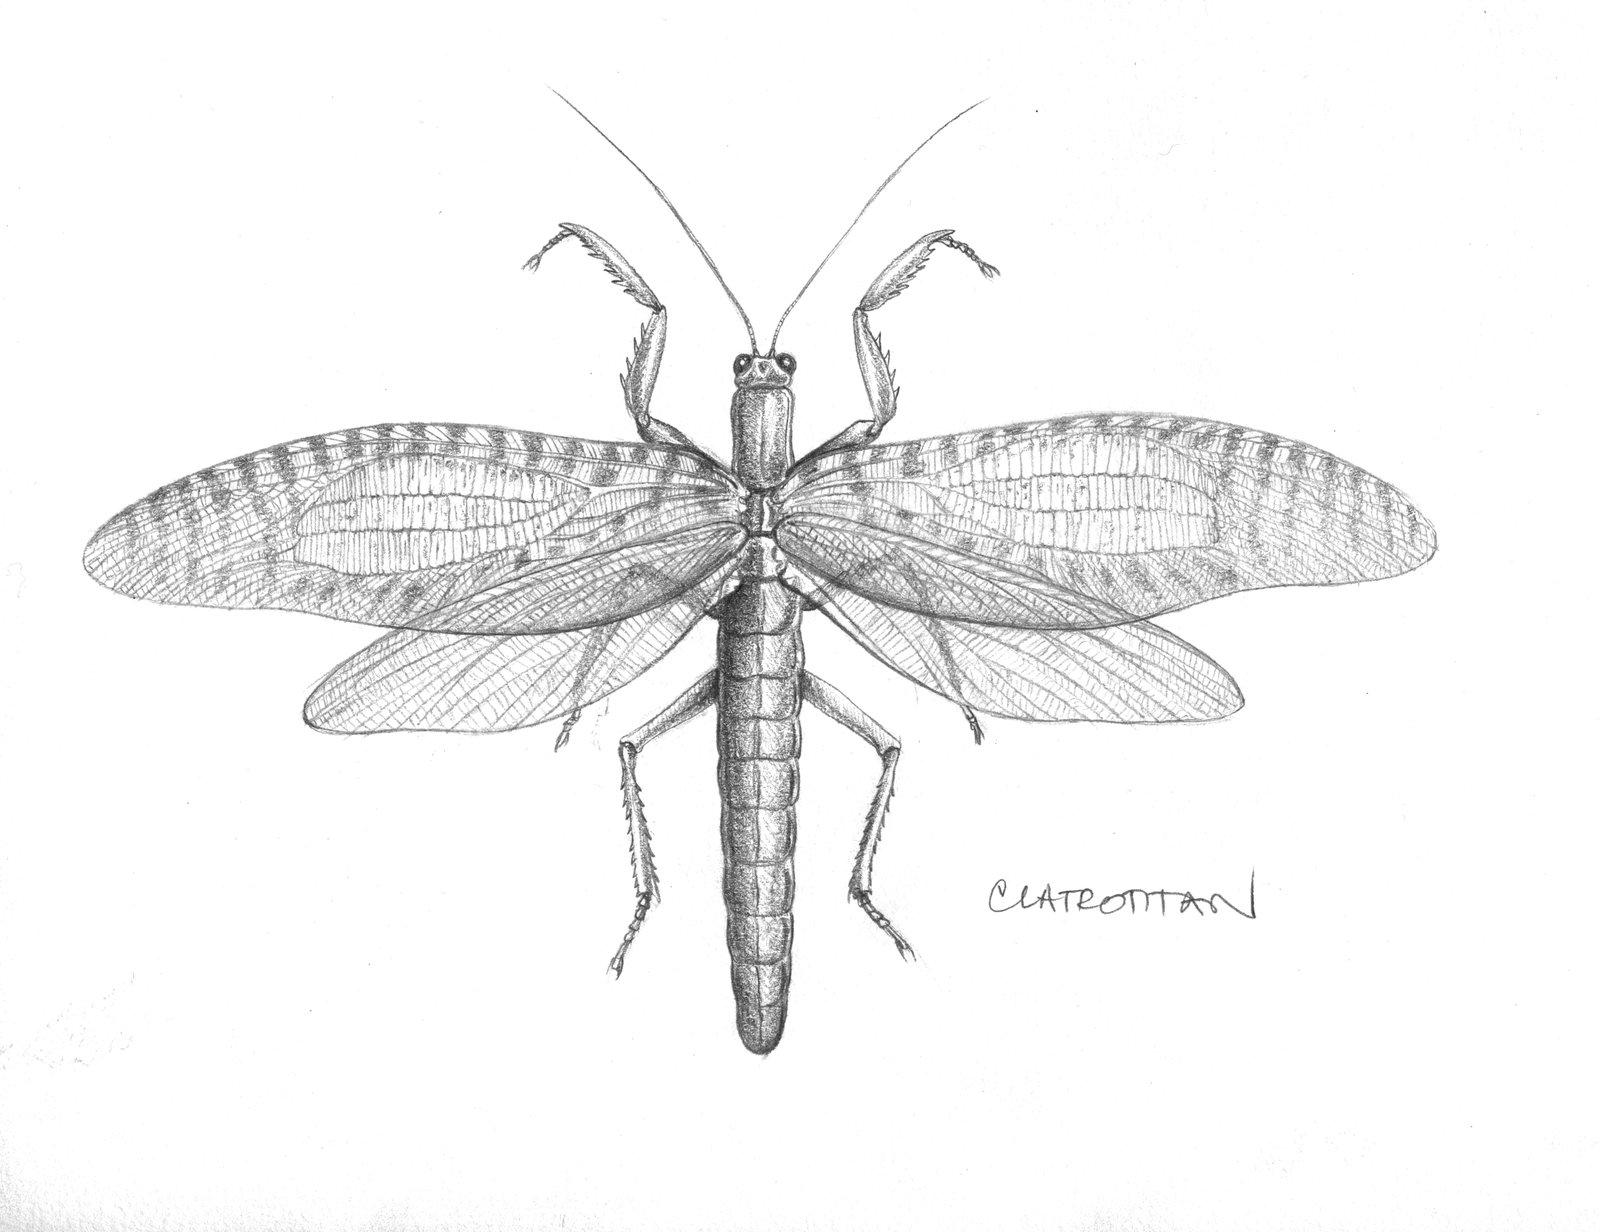 Illustration of clatrotitan andersoni